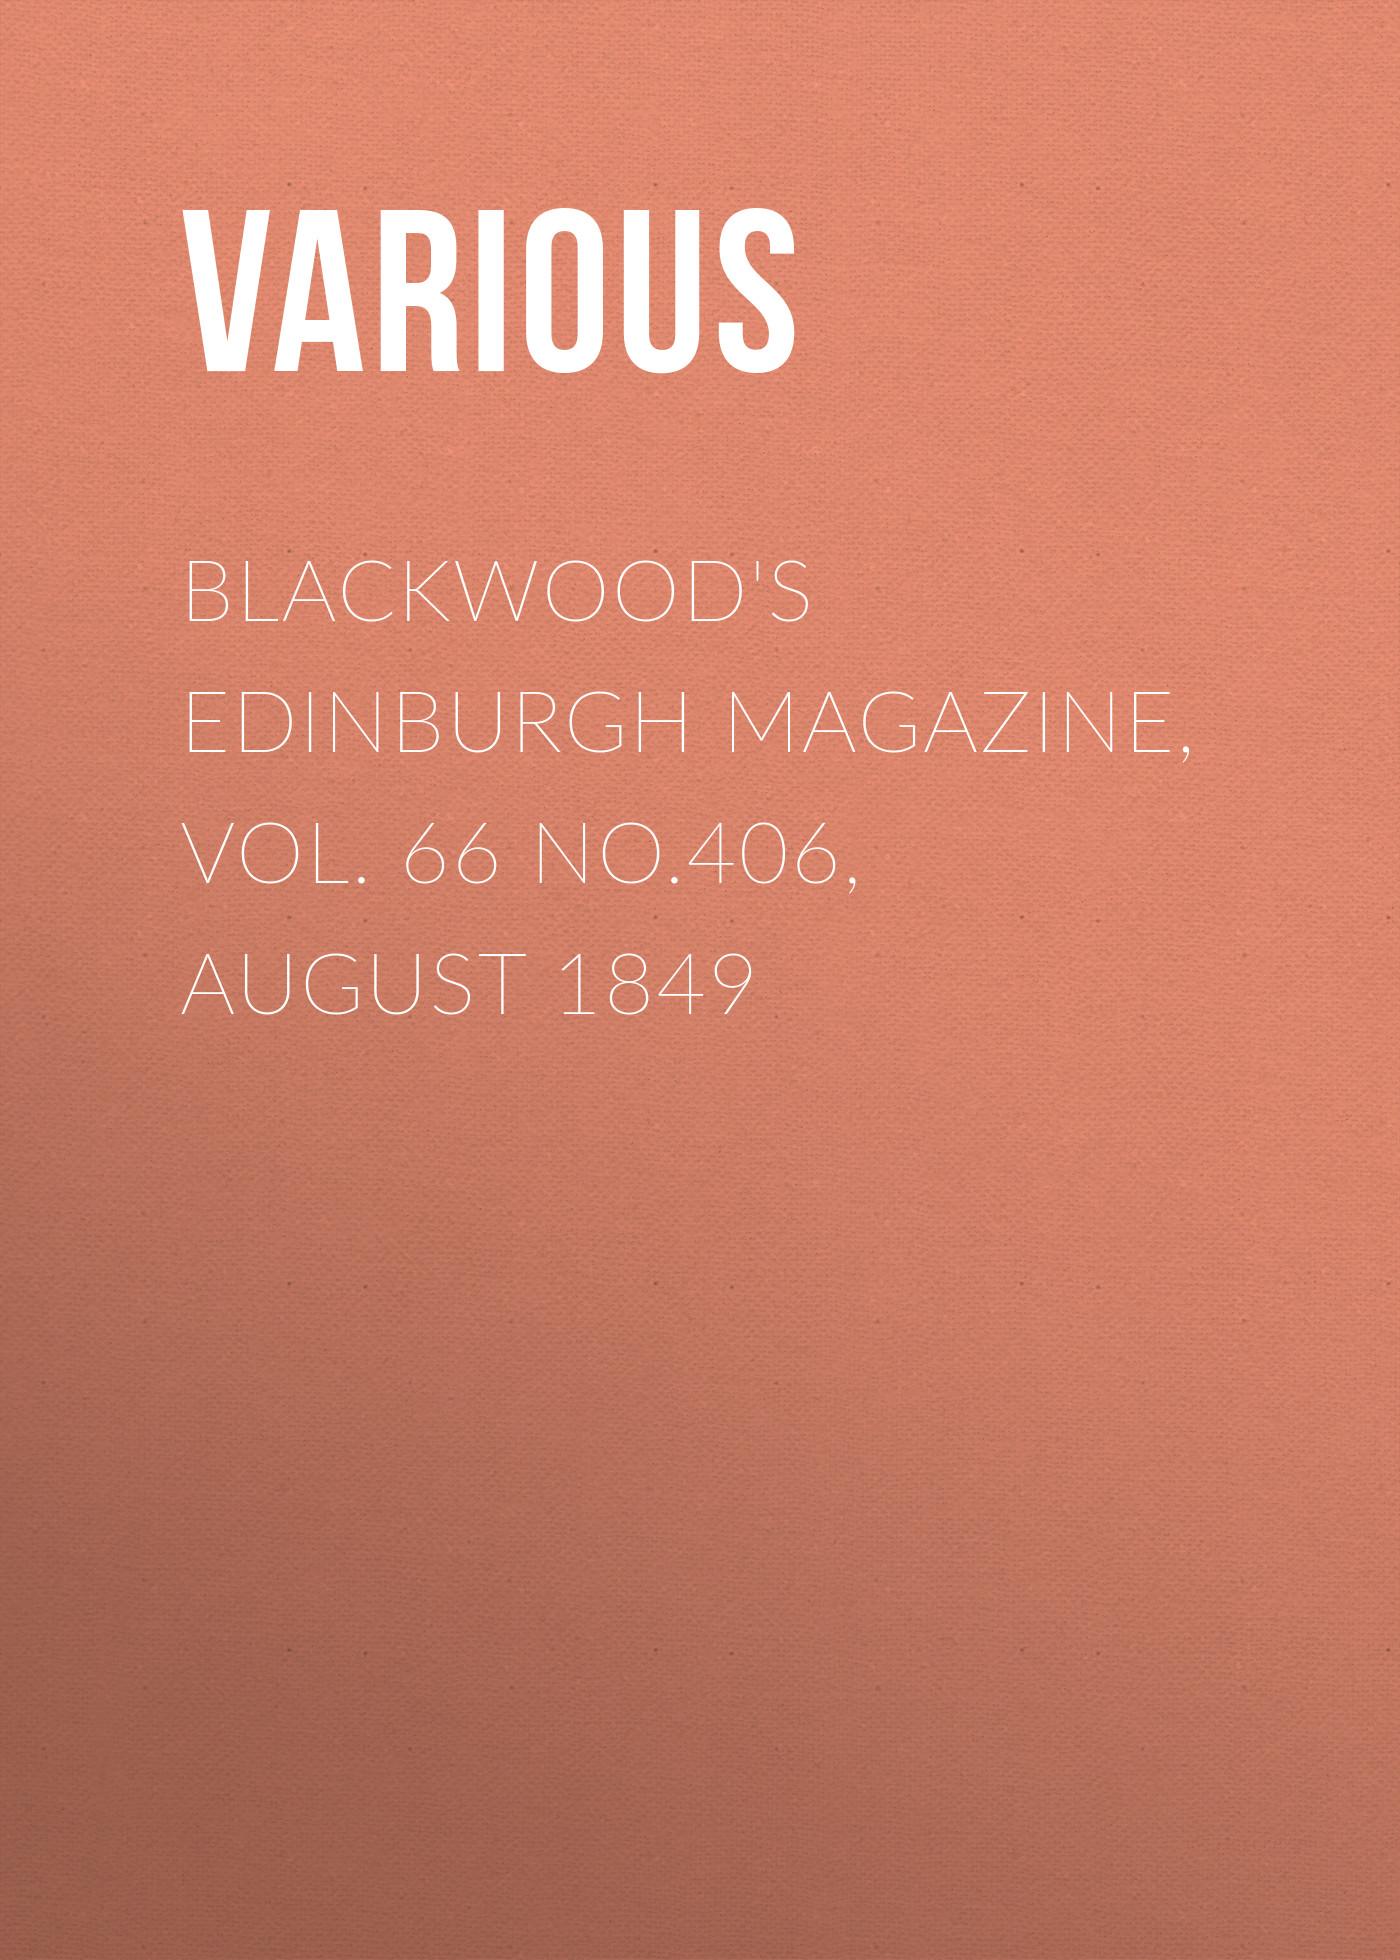 Various Blackwood's Edinburgh Magazine, Vol. 66 No.406, August 1849 various blackwood s edinburgh magazine vol 58 no 357 july 1845